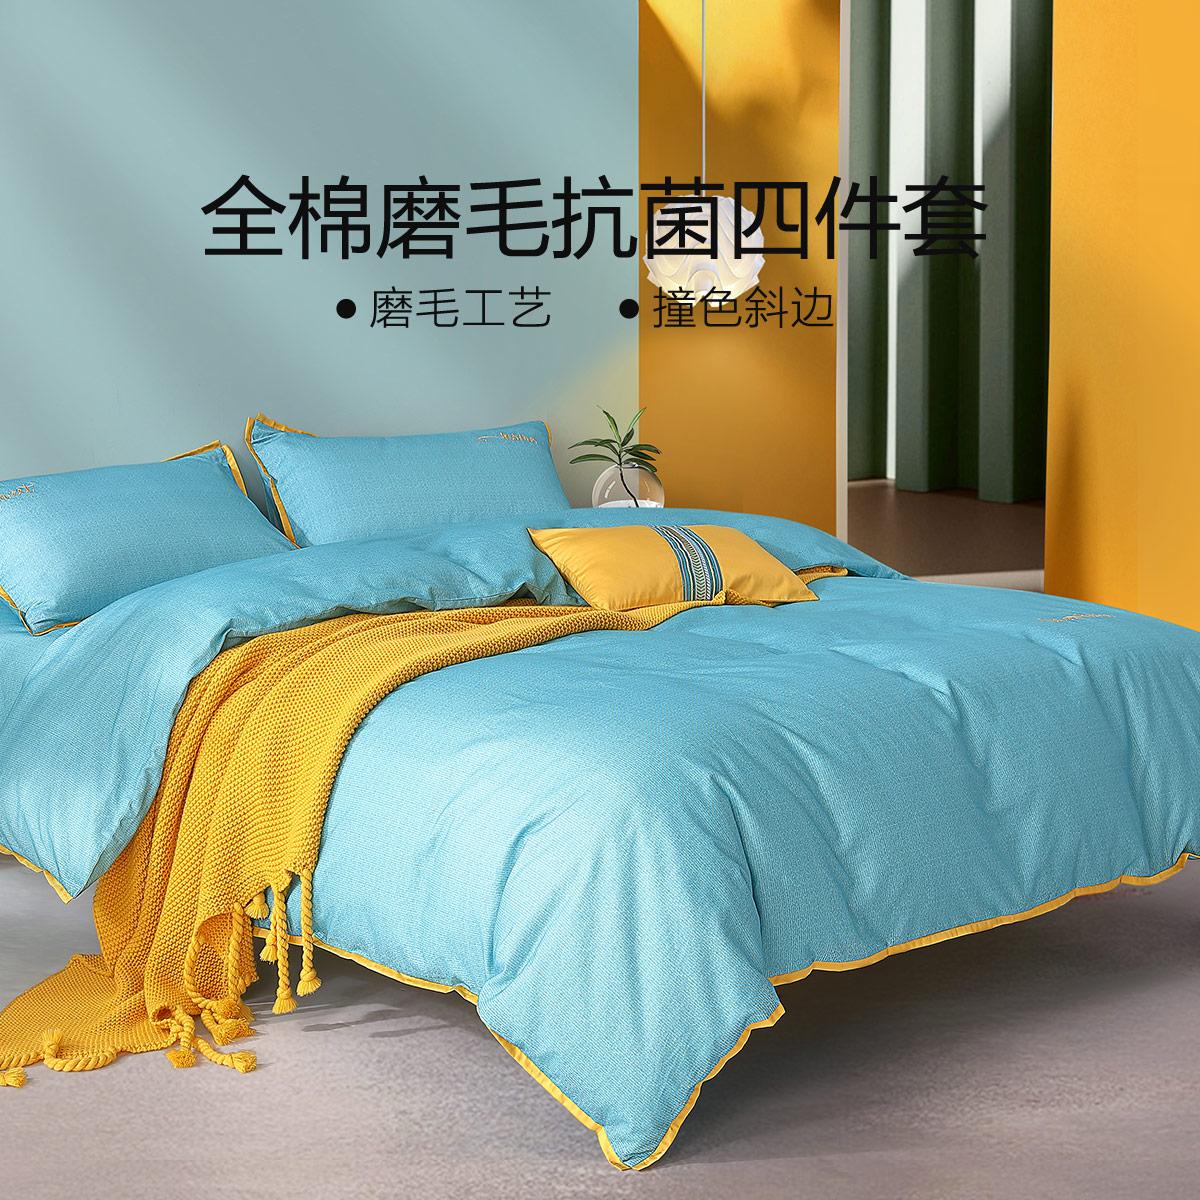 DD129水星家纺全棉磨毛套件 床上用品